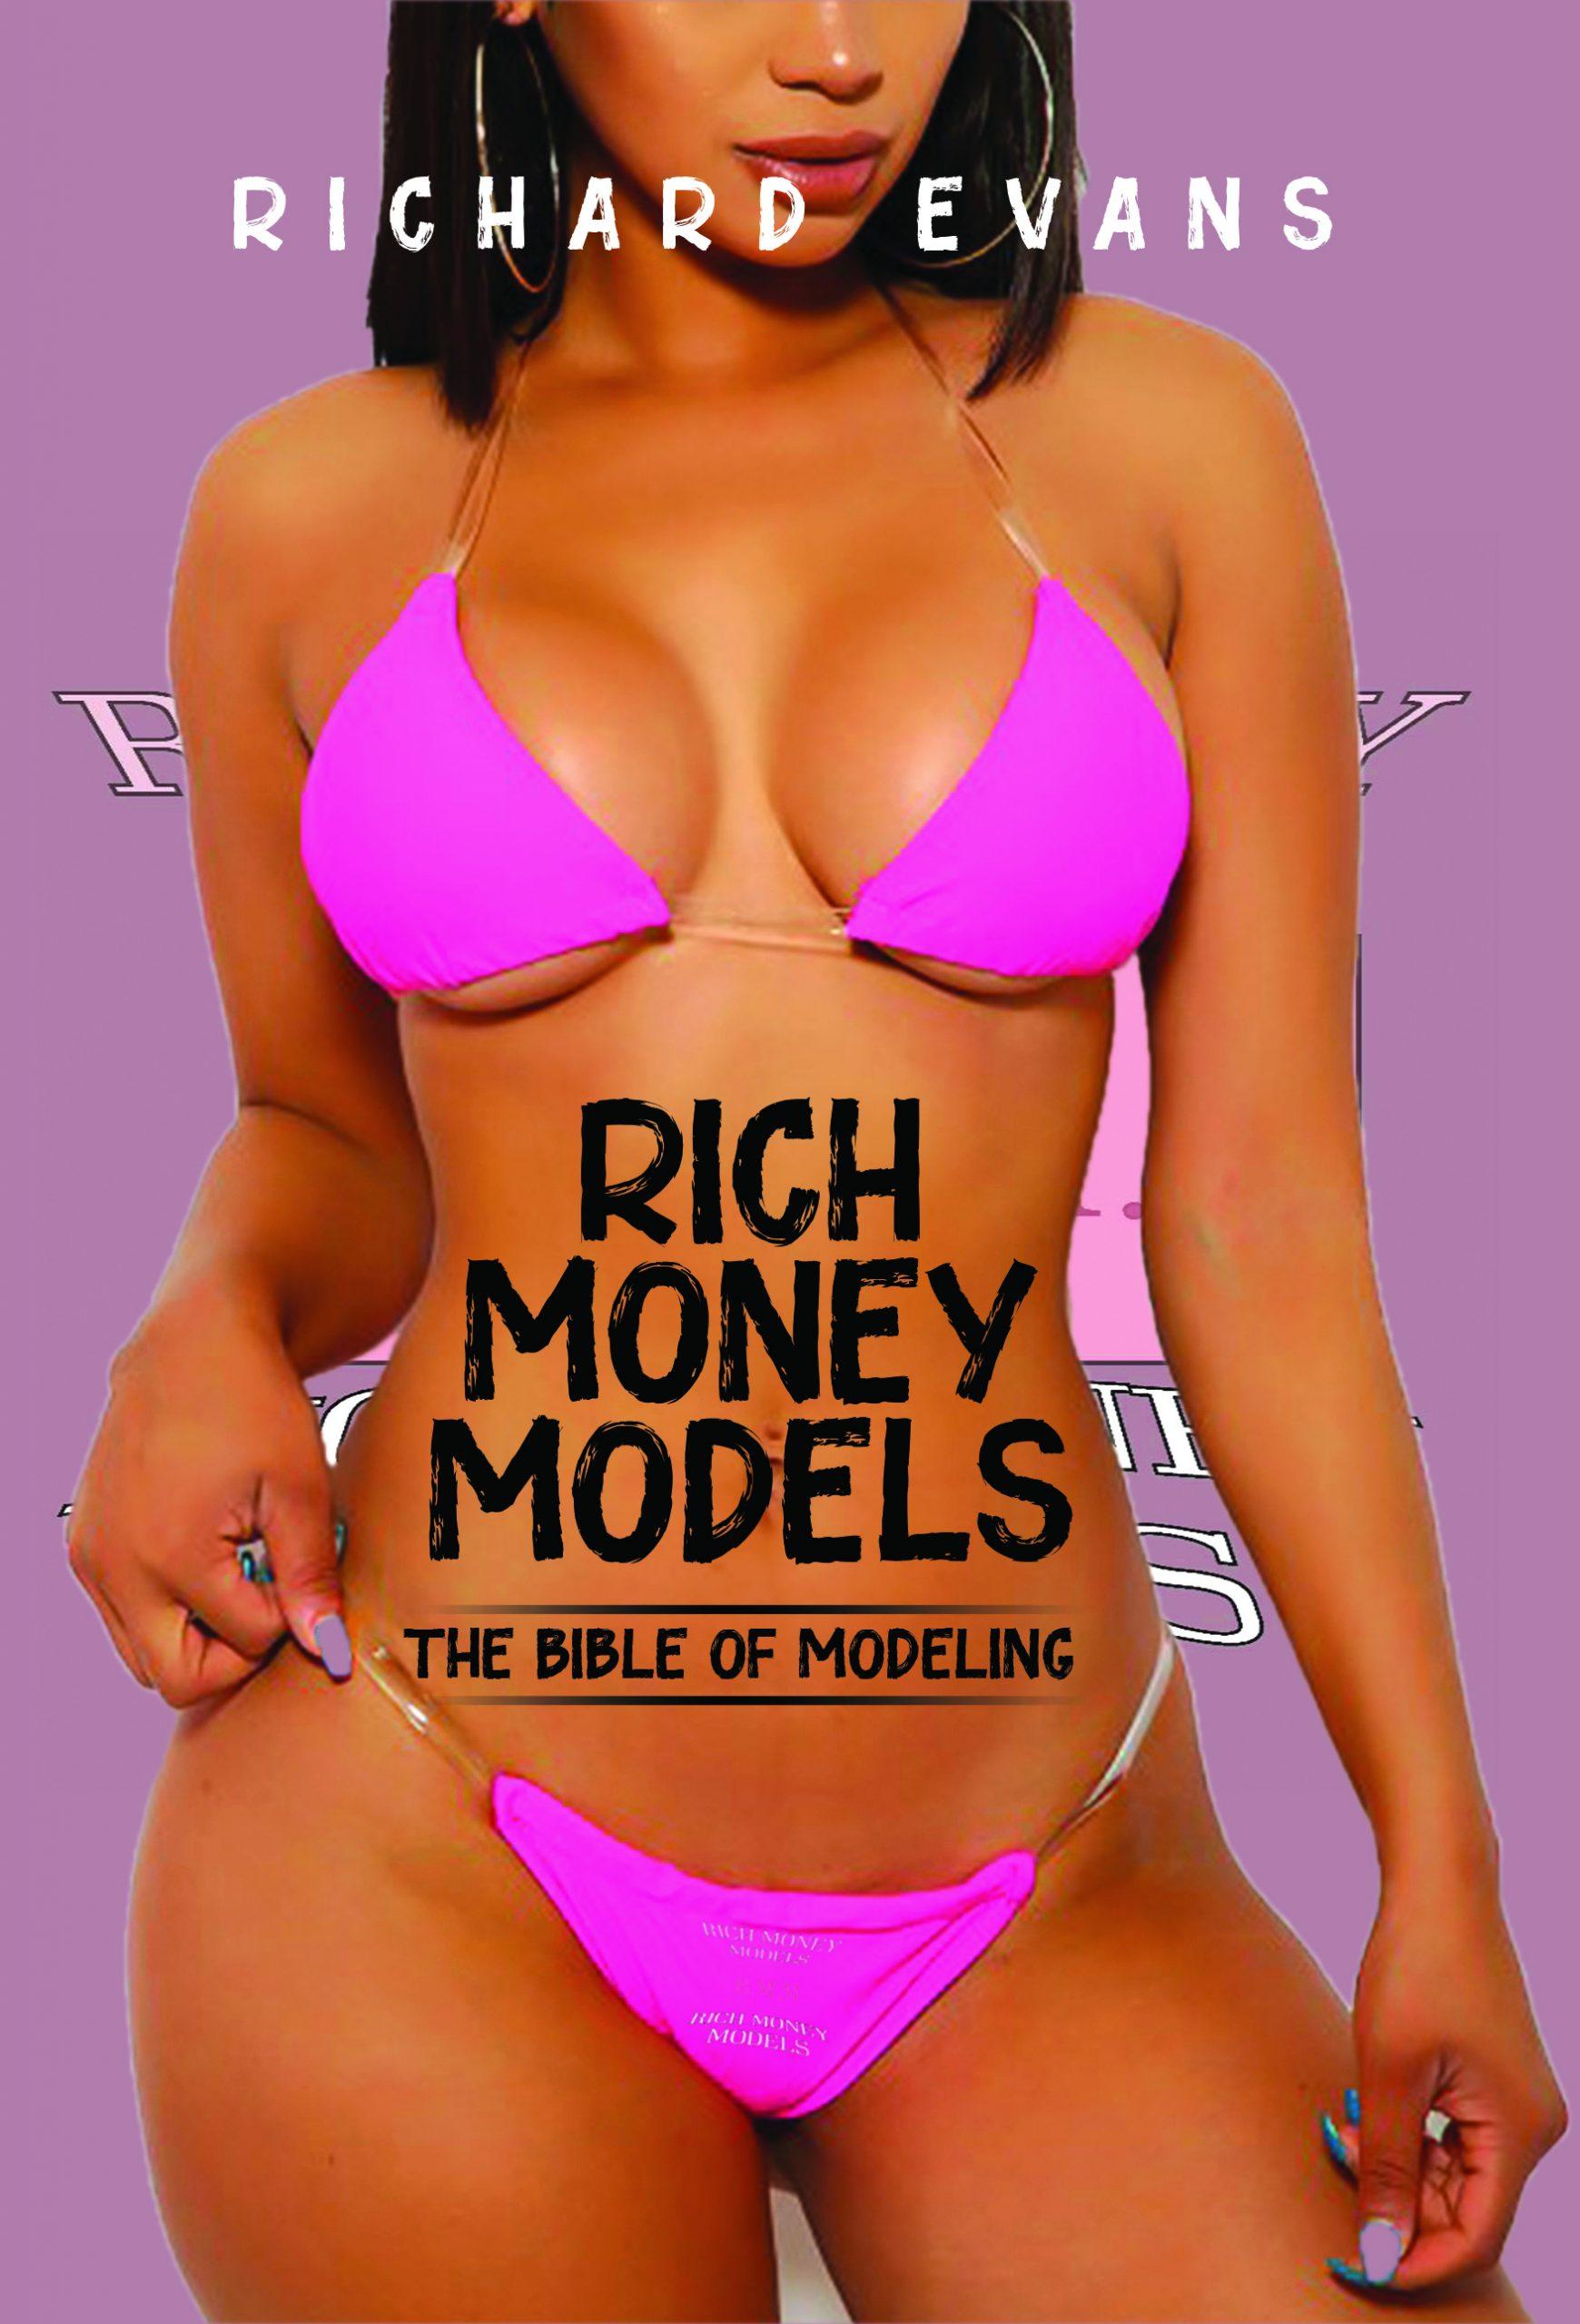 Rich Money Models by Richard Evans